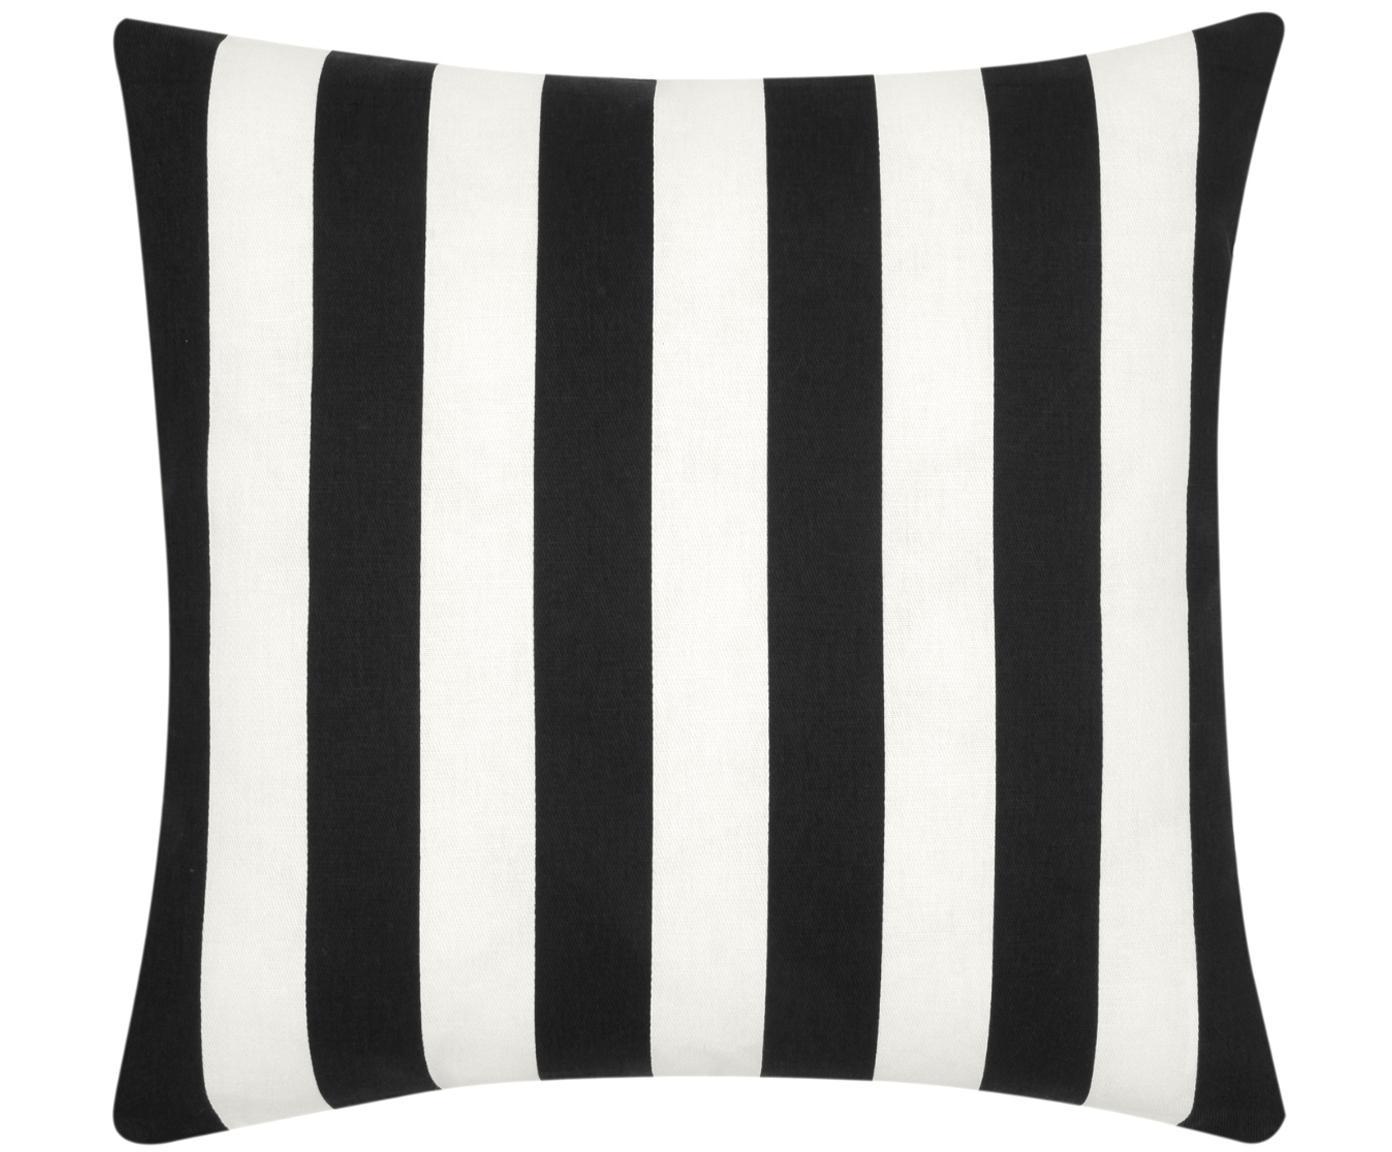 Funda de cojín Timon, Algodón, Negro, blanco, An 45 x L 45 cm